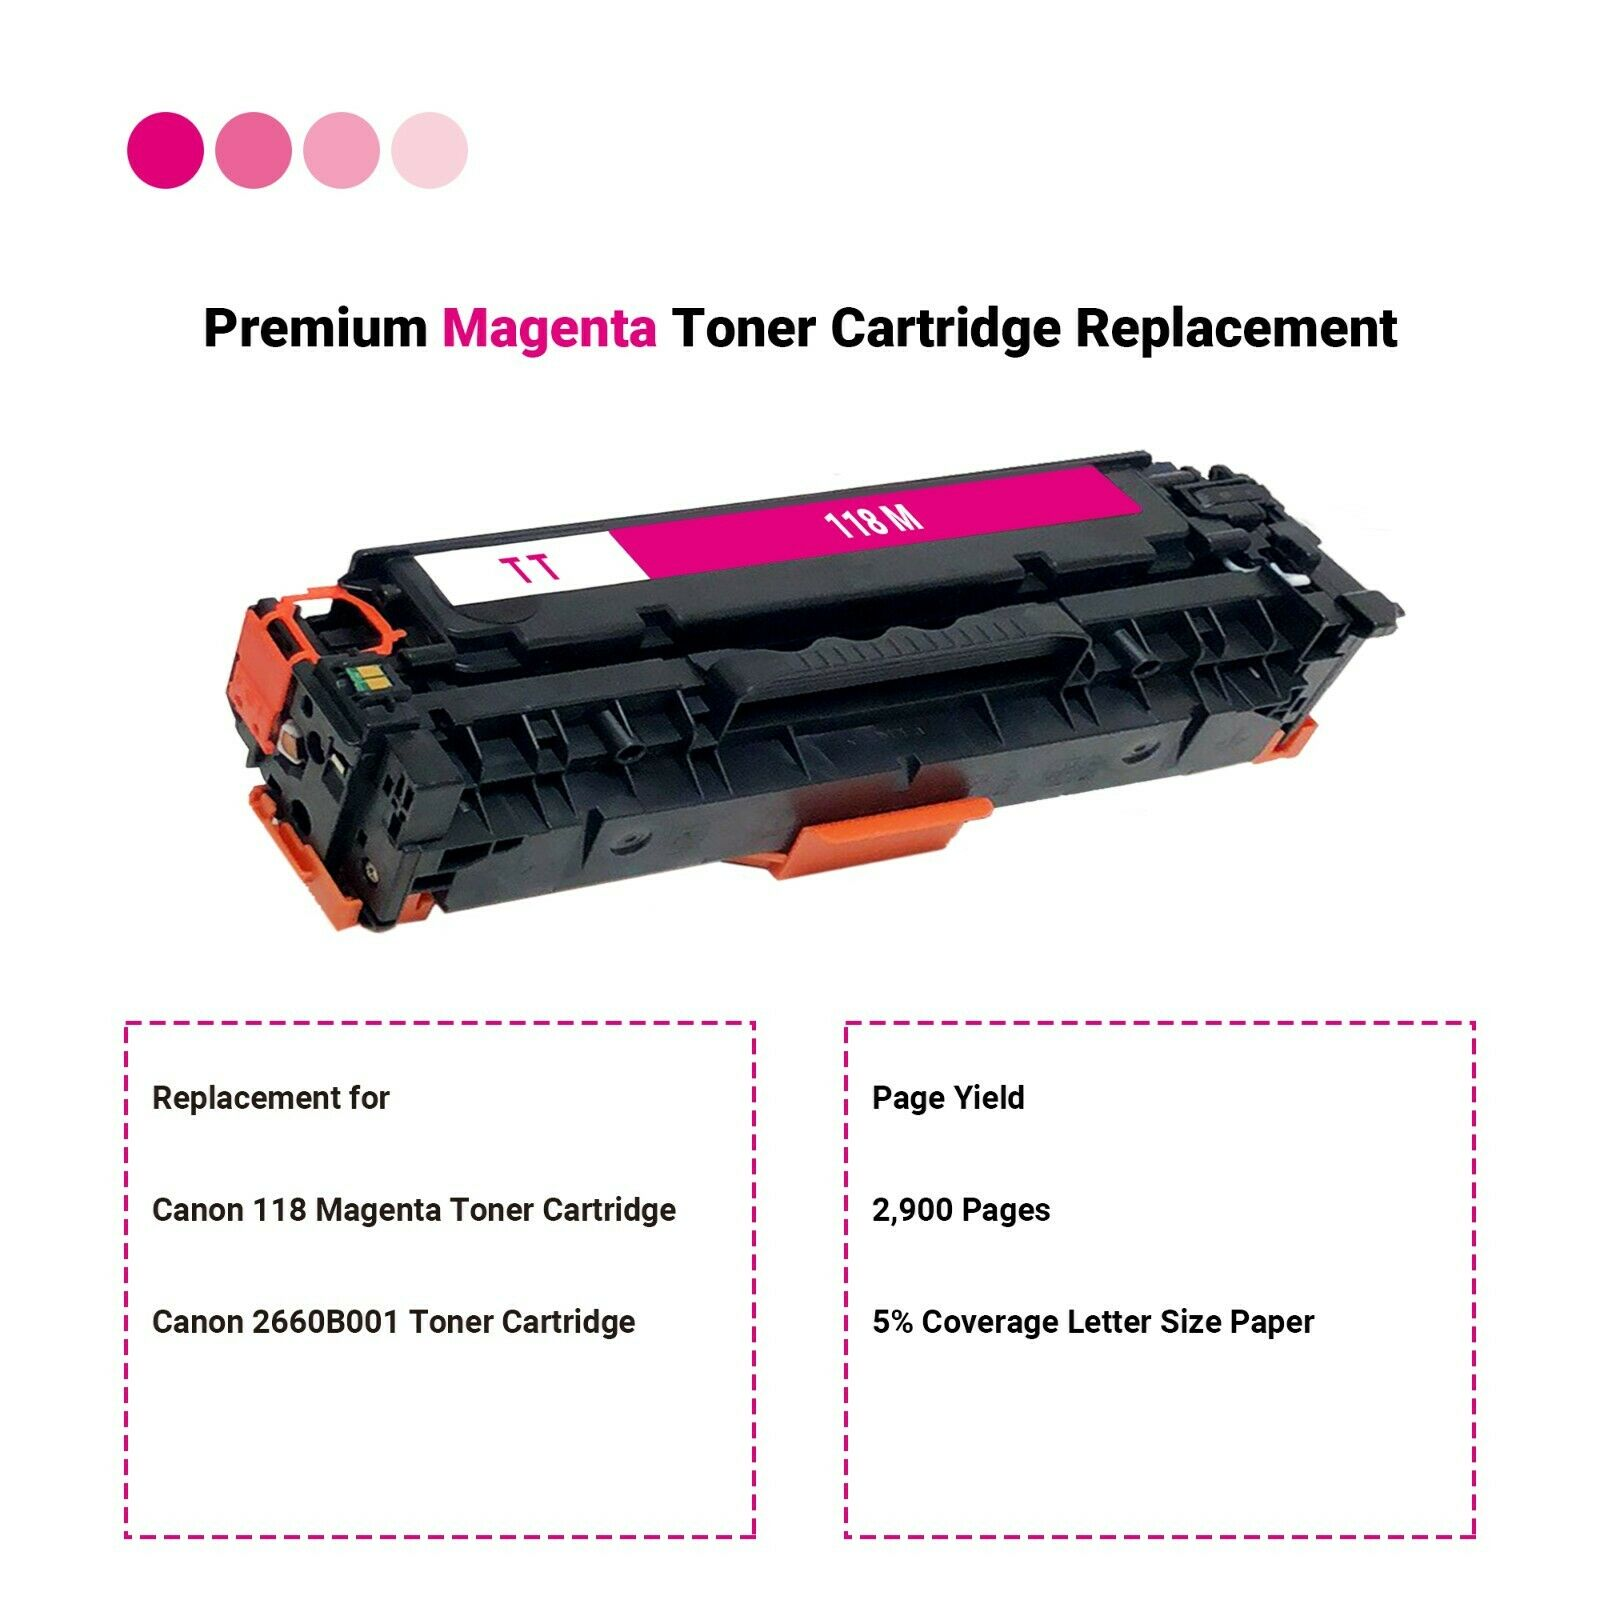 MF8380Cdw MF729Cdw 2660B001 LBP7660Cdn Laser Printers for Canon Color imageCLASS MF8350Cdn Cartridge 118 Magenta MF726Cdw 1 Pack Canon Genuine Toner MF8580Cdw LBP7200Cdn